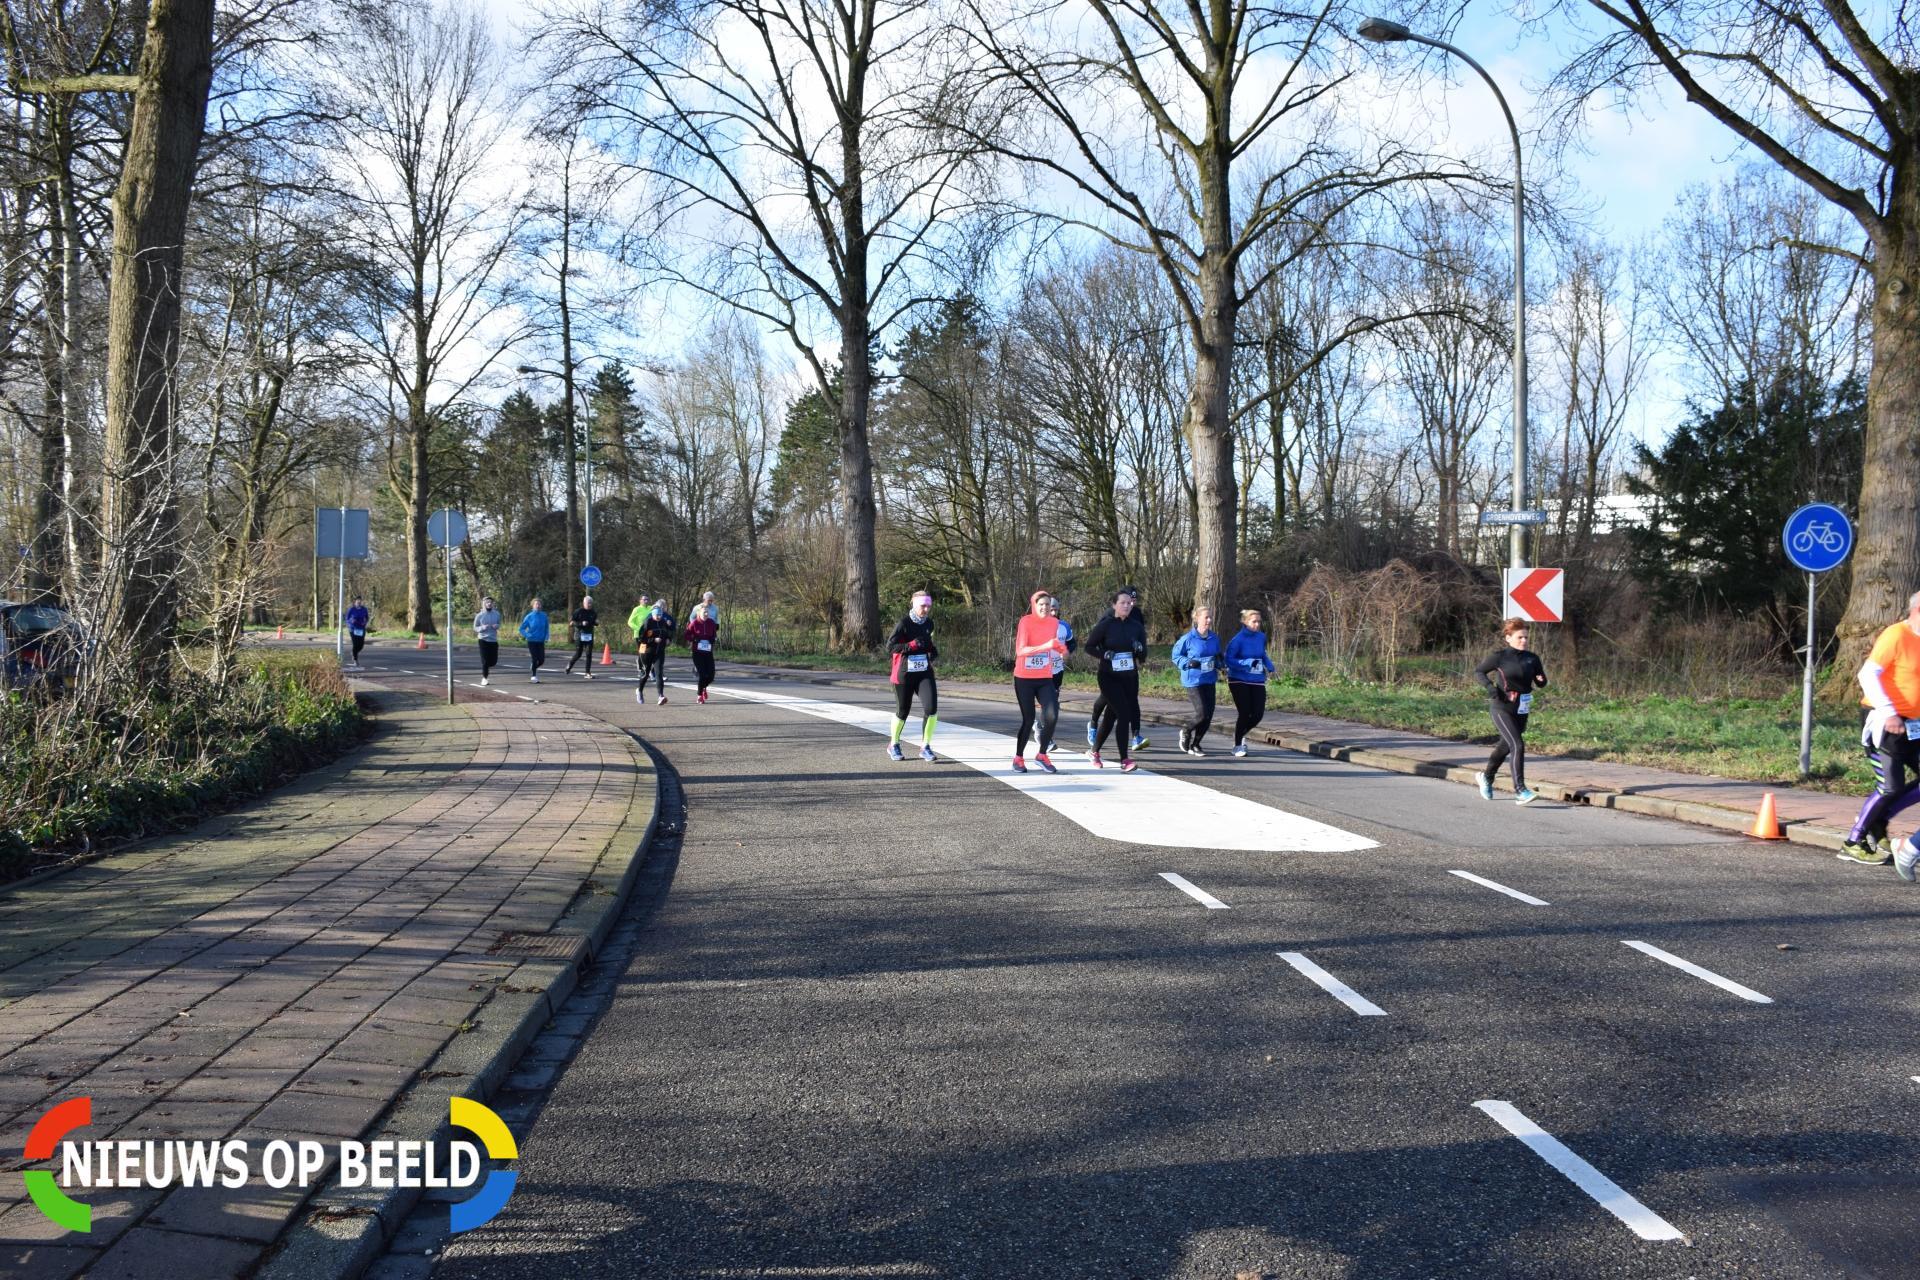 Groenhovenloop van start gegaan Groenhovenweg Gouda